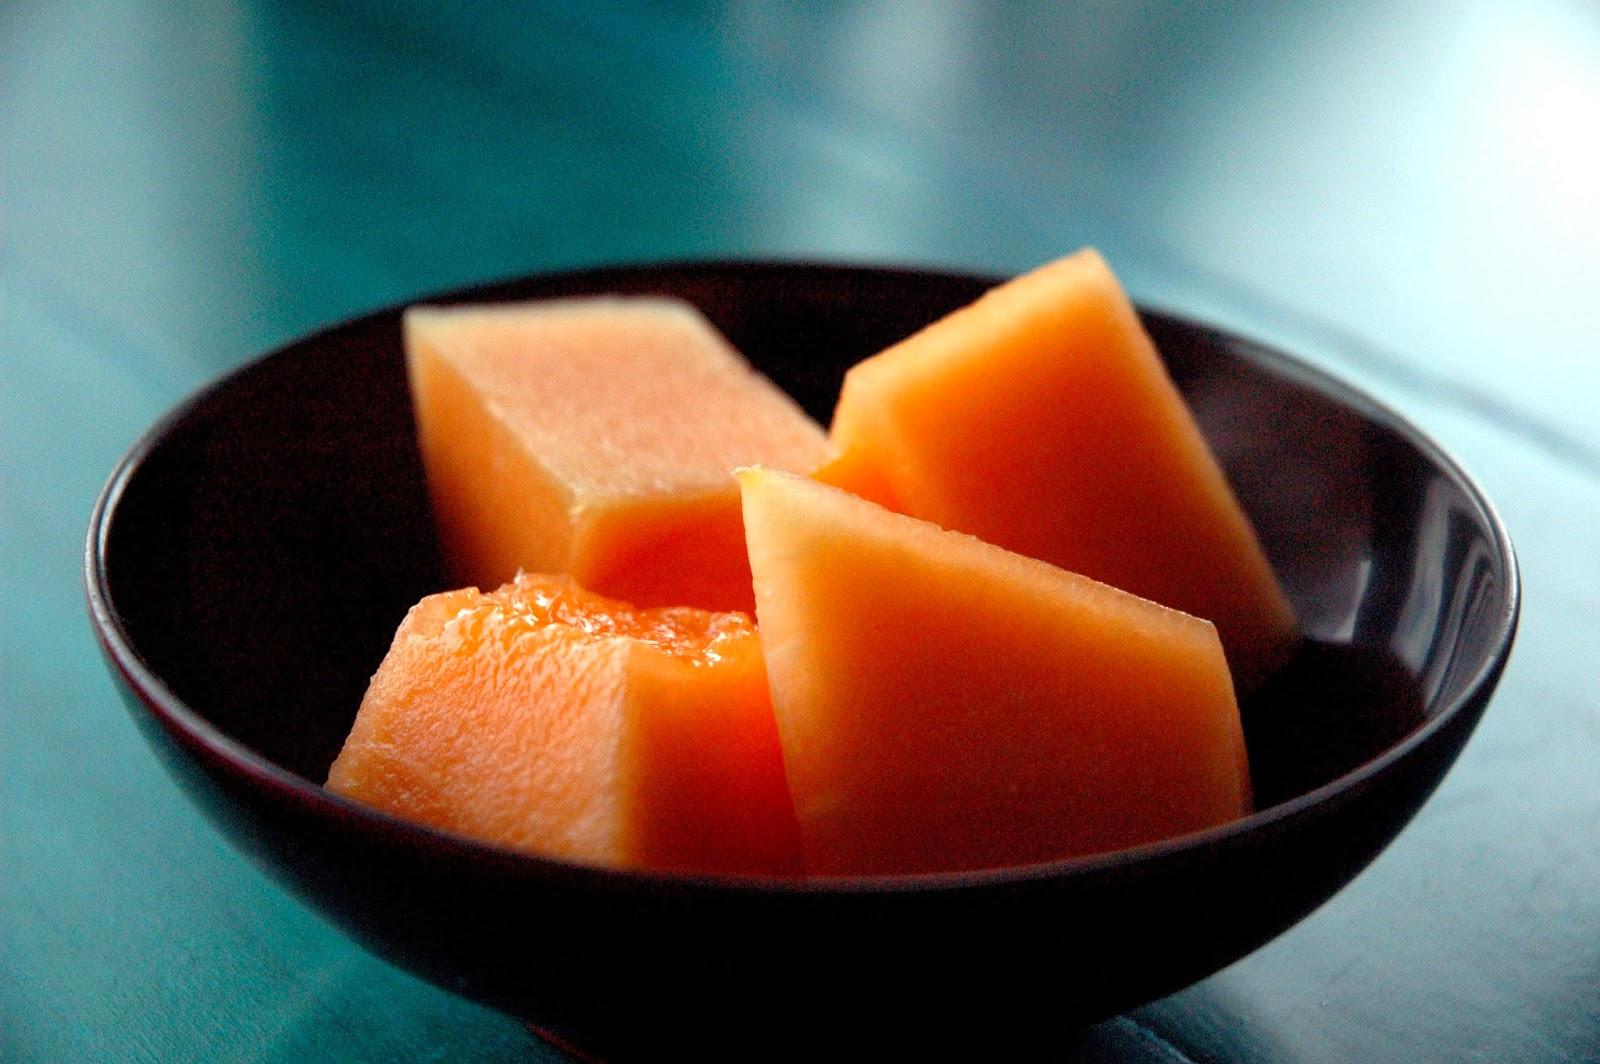 DUDE FOR FOOD: Huat Pot Redux: A Few Tips to Enjoy Your Huat